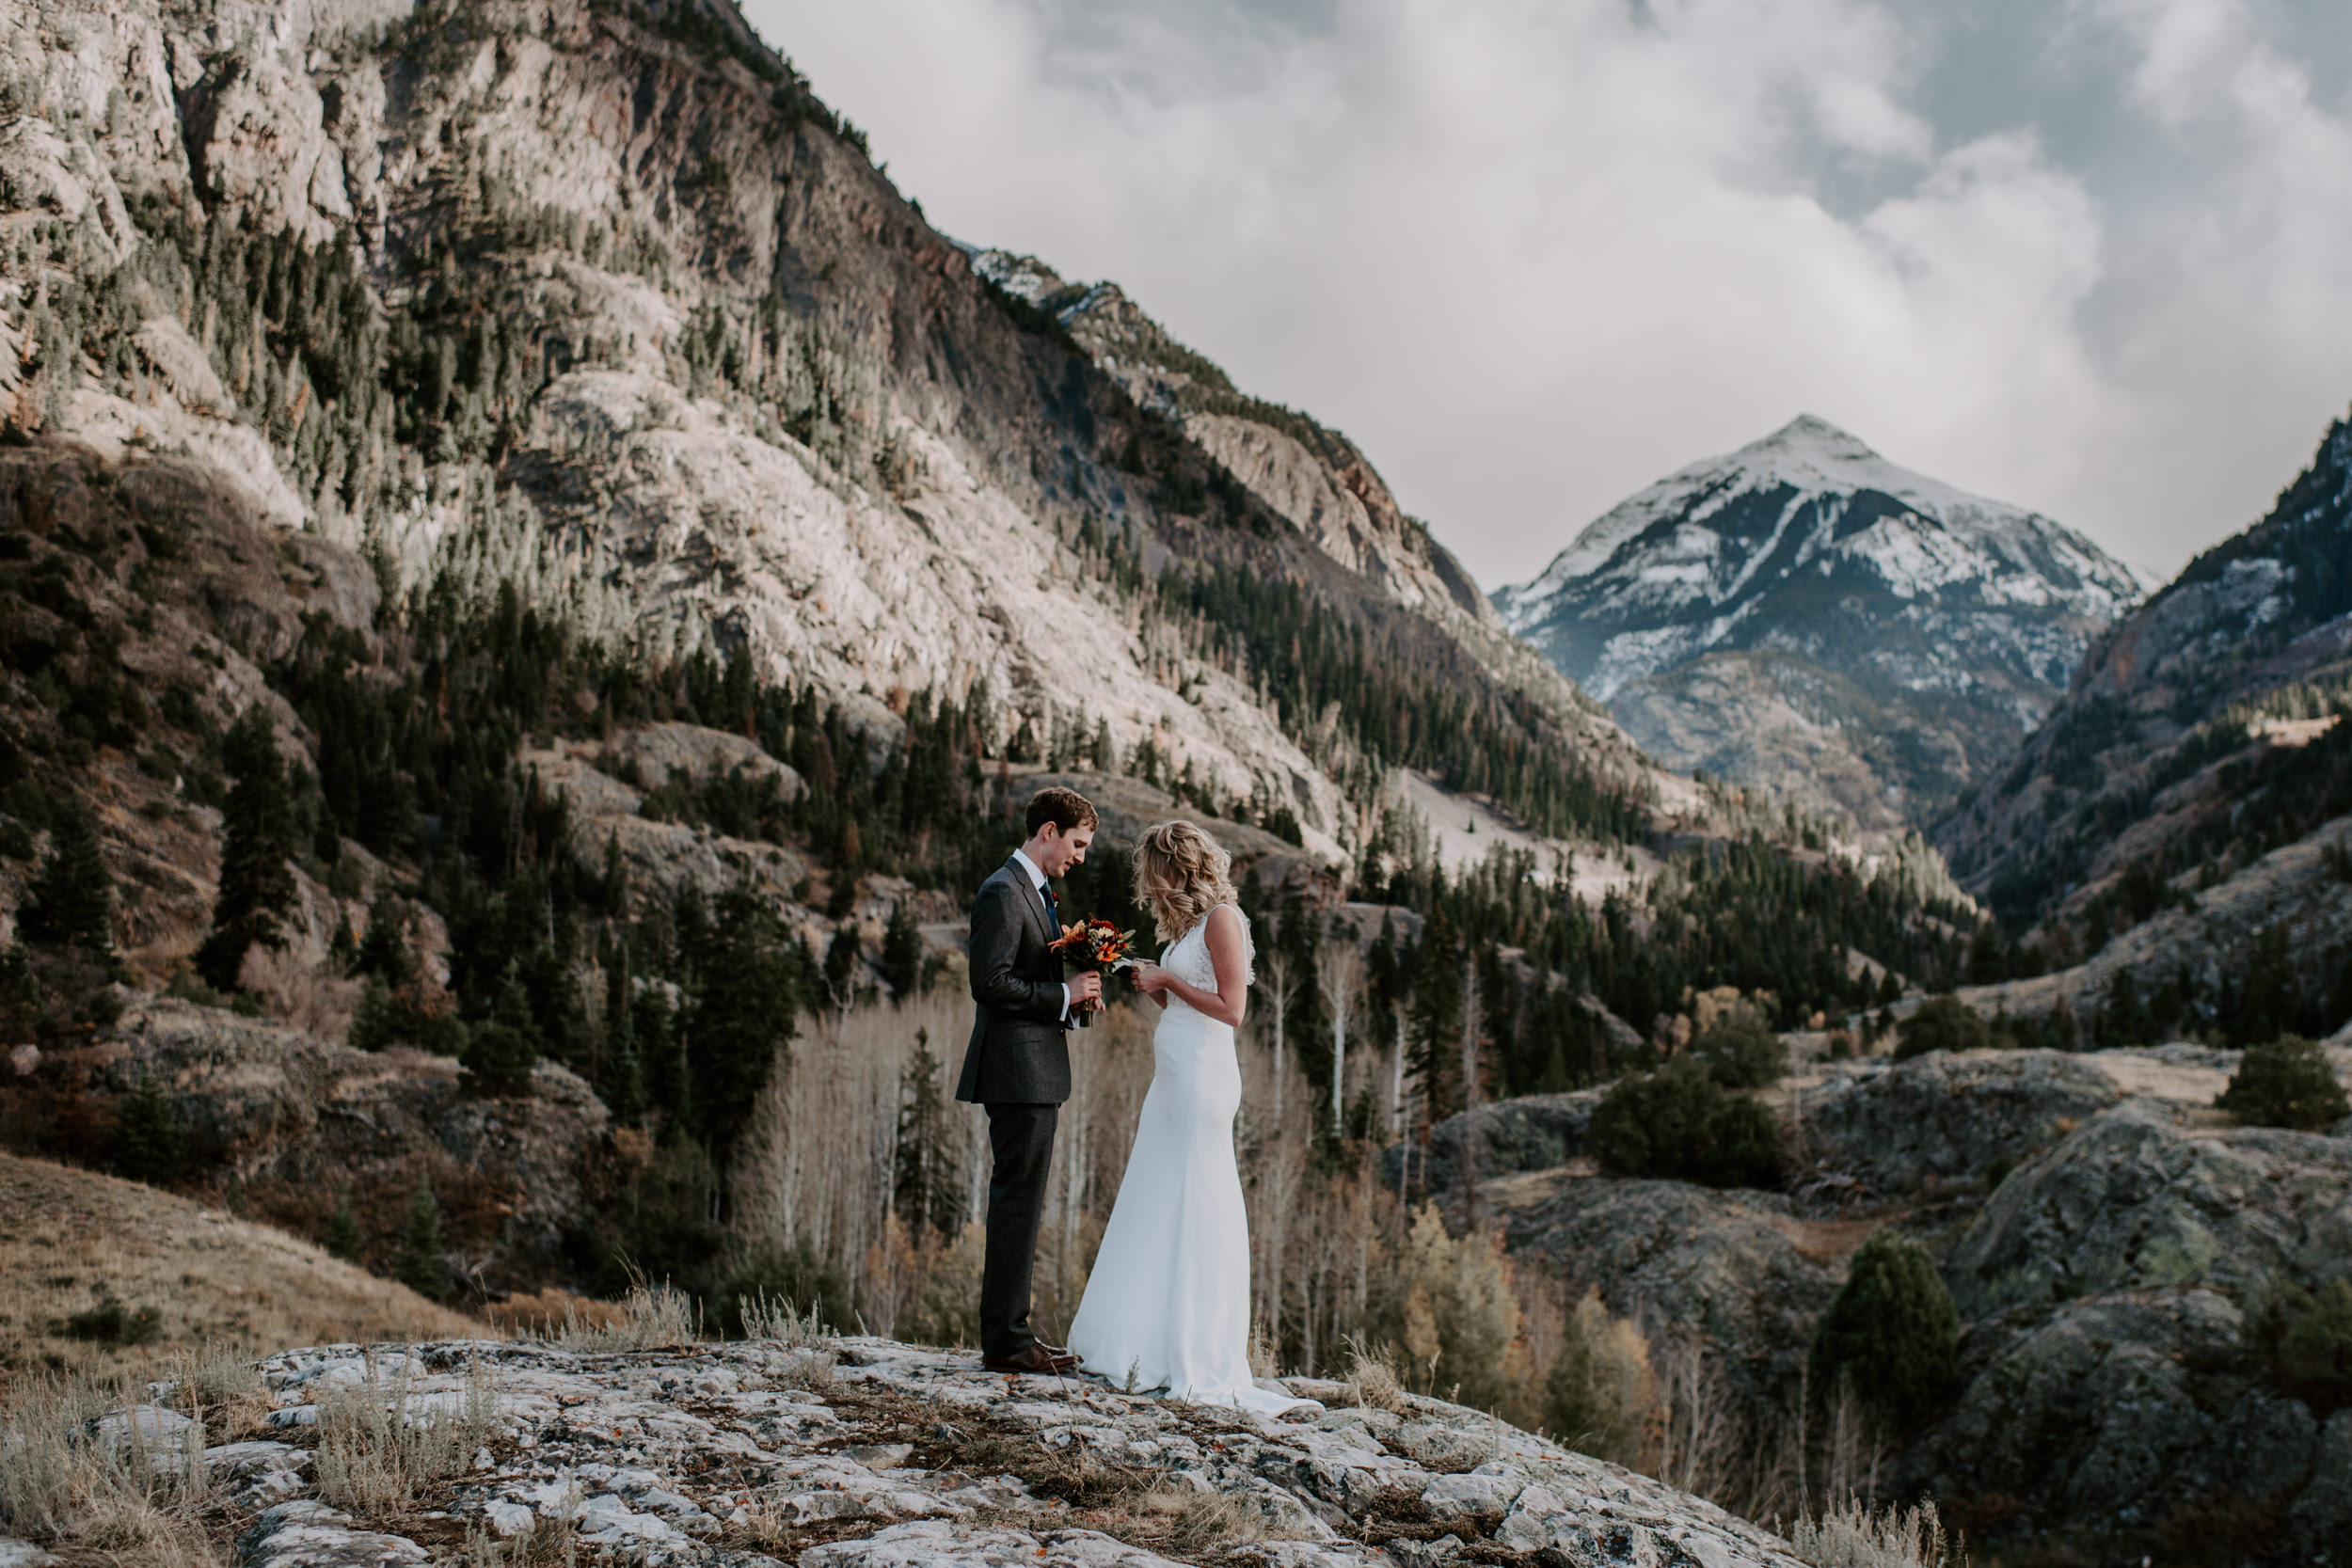 Wedding ceremony, Ouray elopement. Colorado wedding photographer.